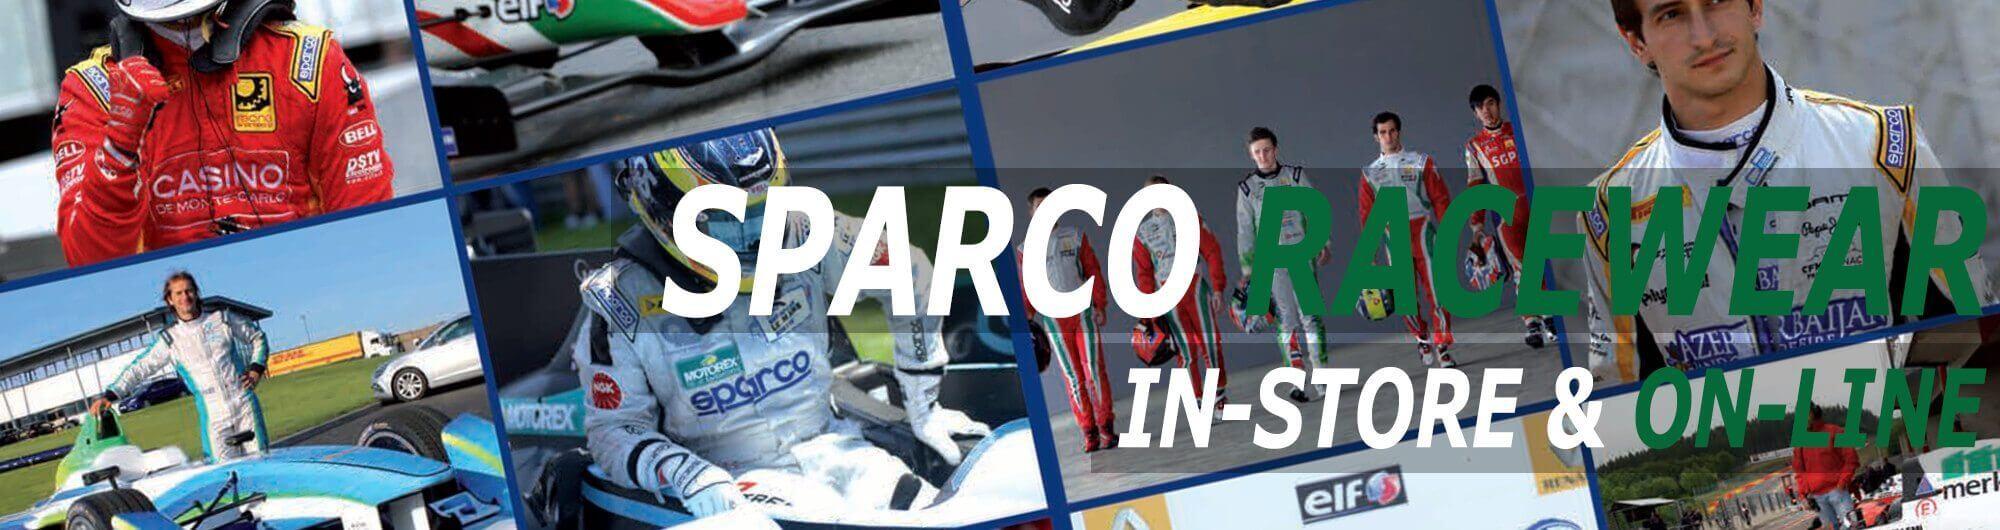 sparco-racewear-hero